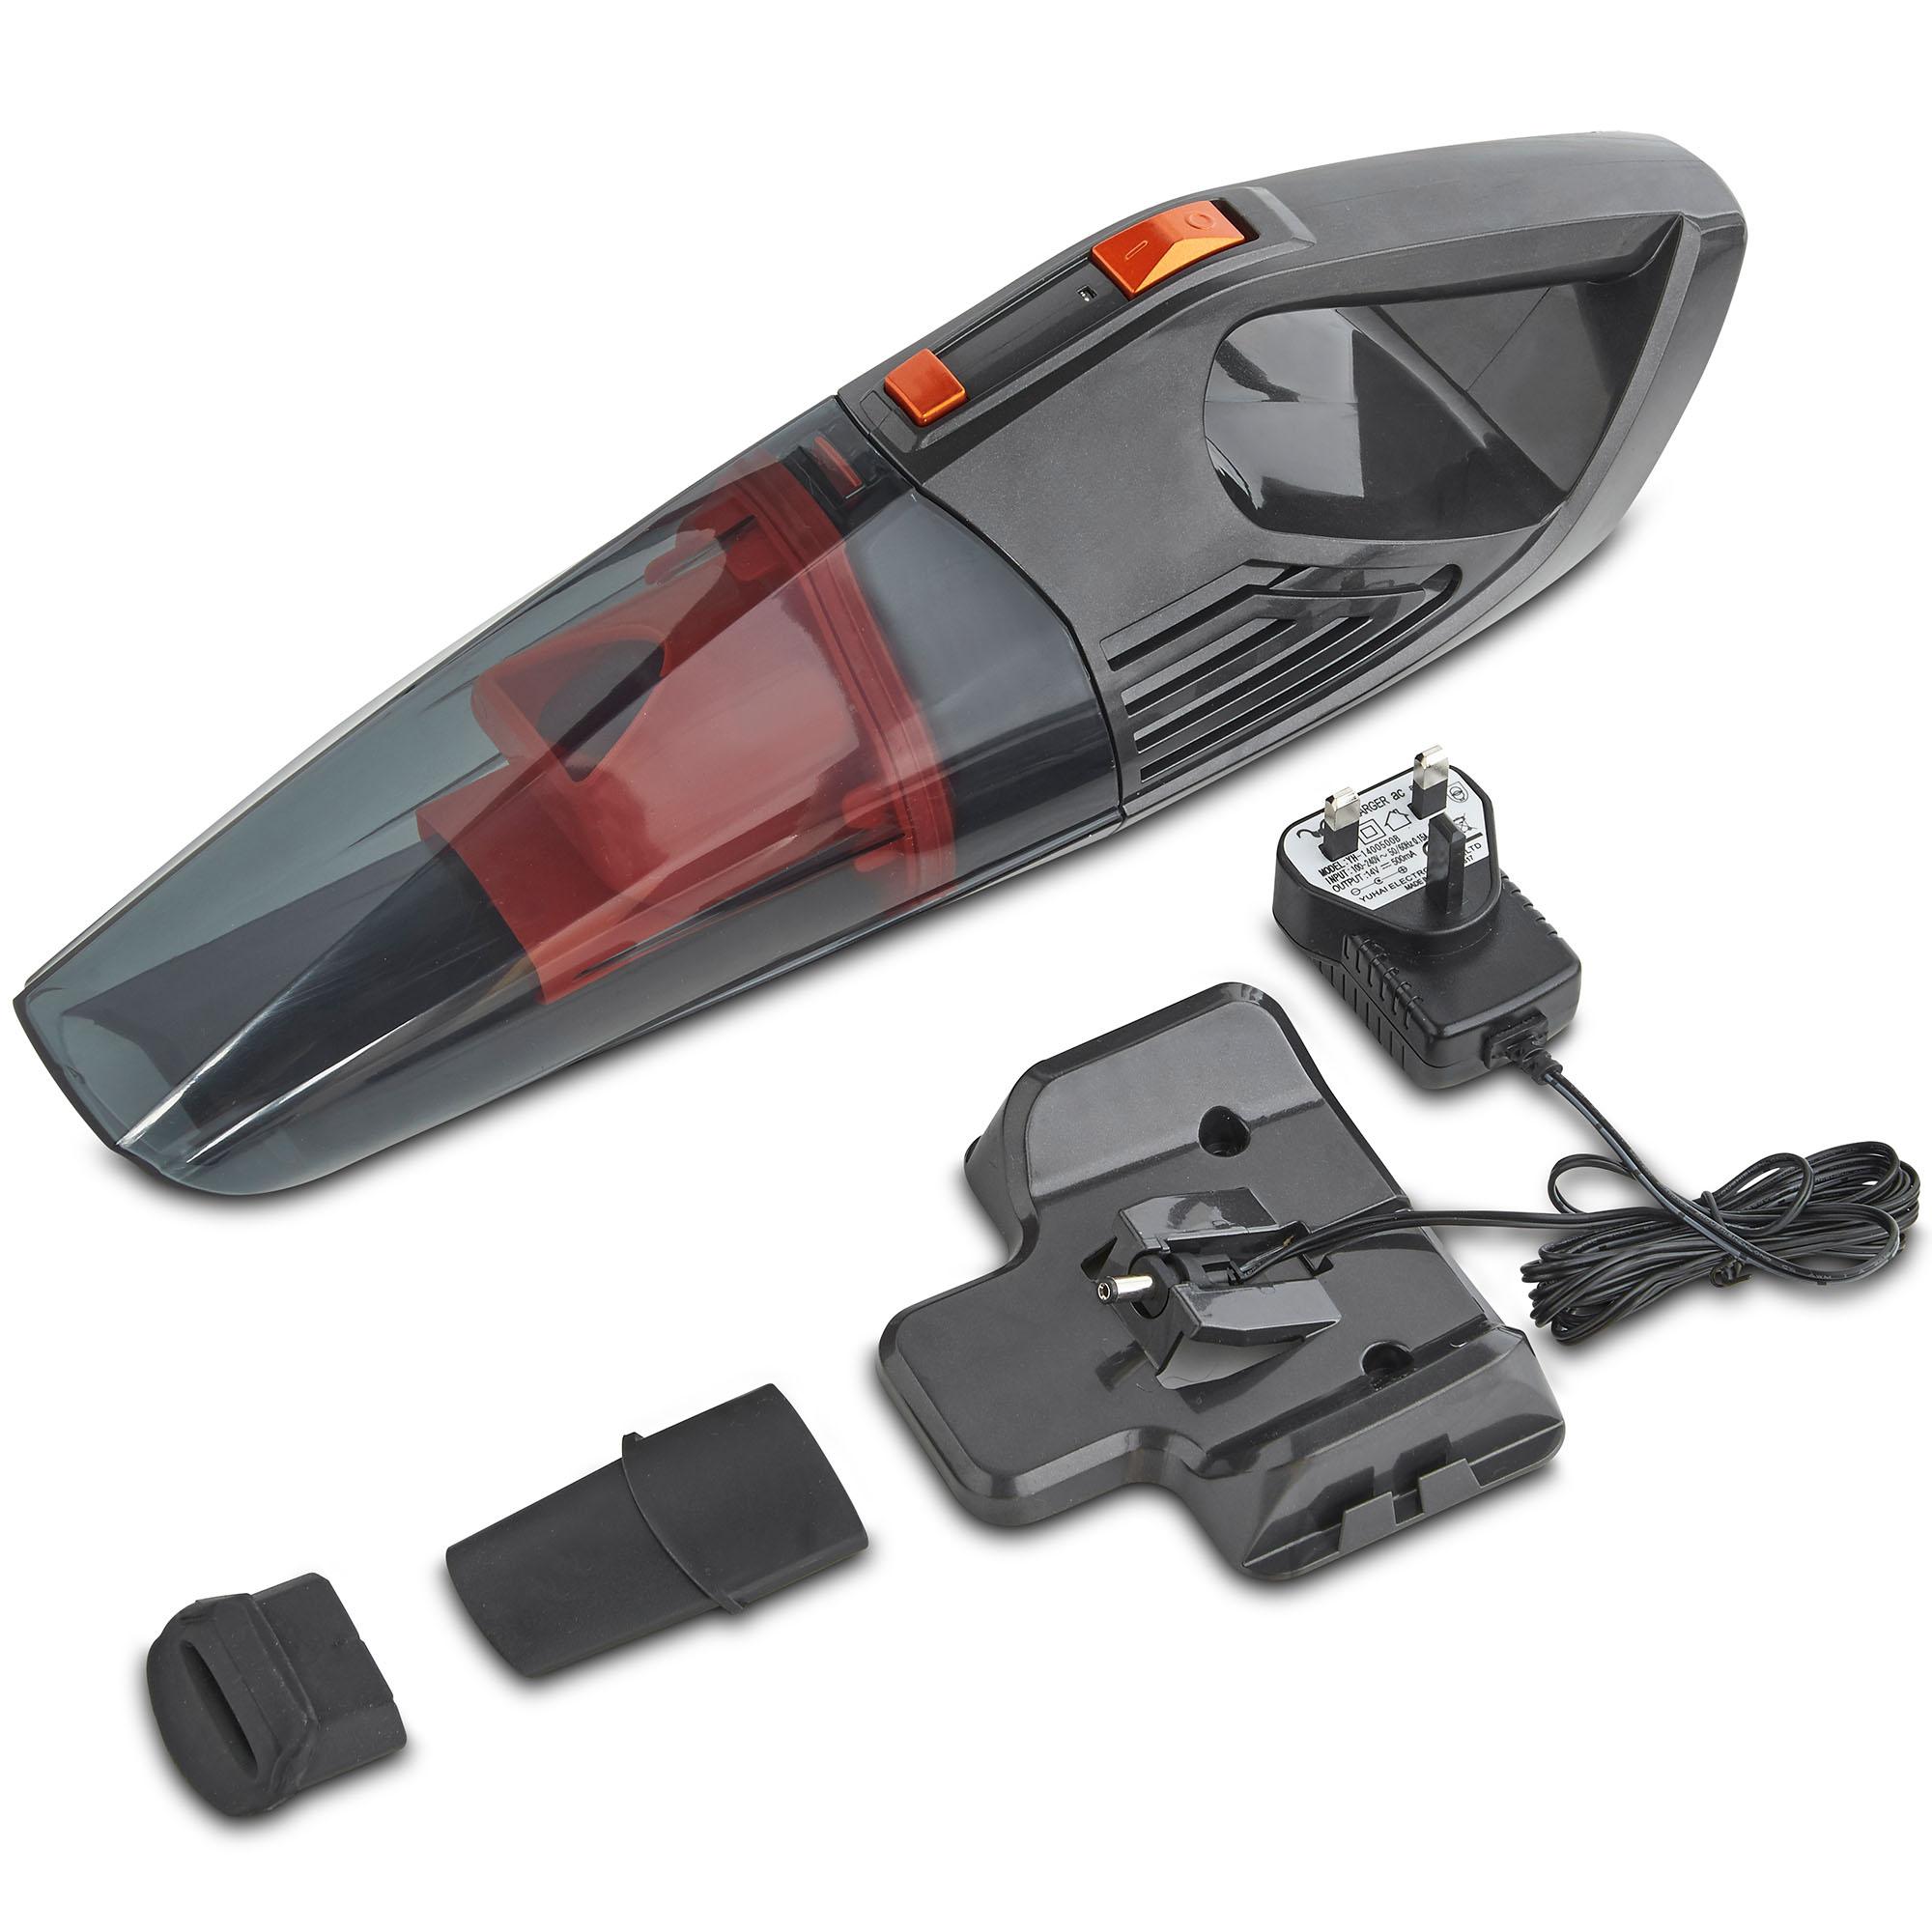 vonhaus 11 1v handheld vac wet dry car van cordless bagless vacuum cleaner ebay. Black Bedroom Furniture Sets. Home Design Ideas